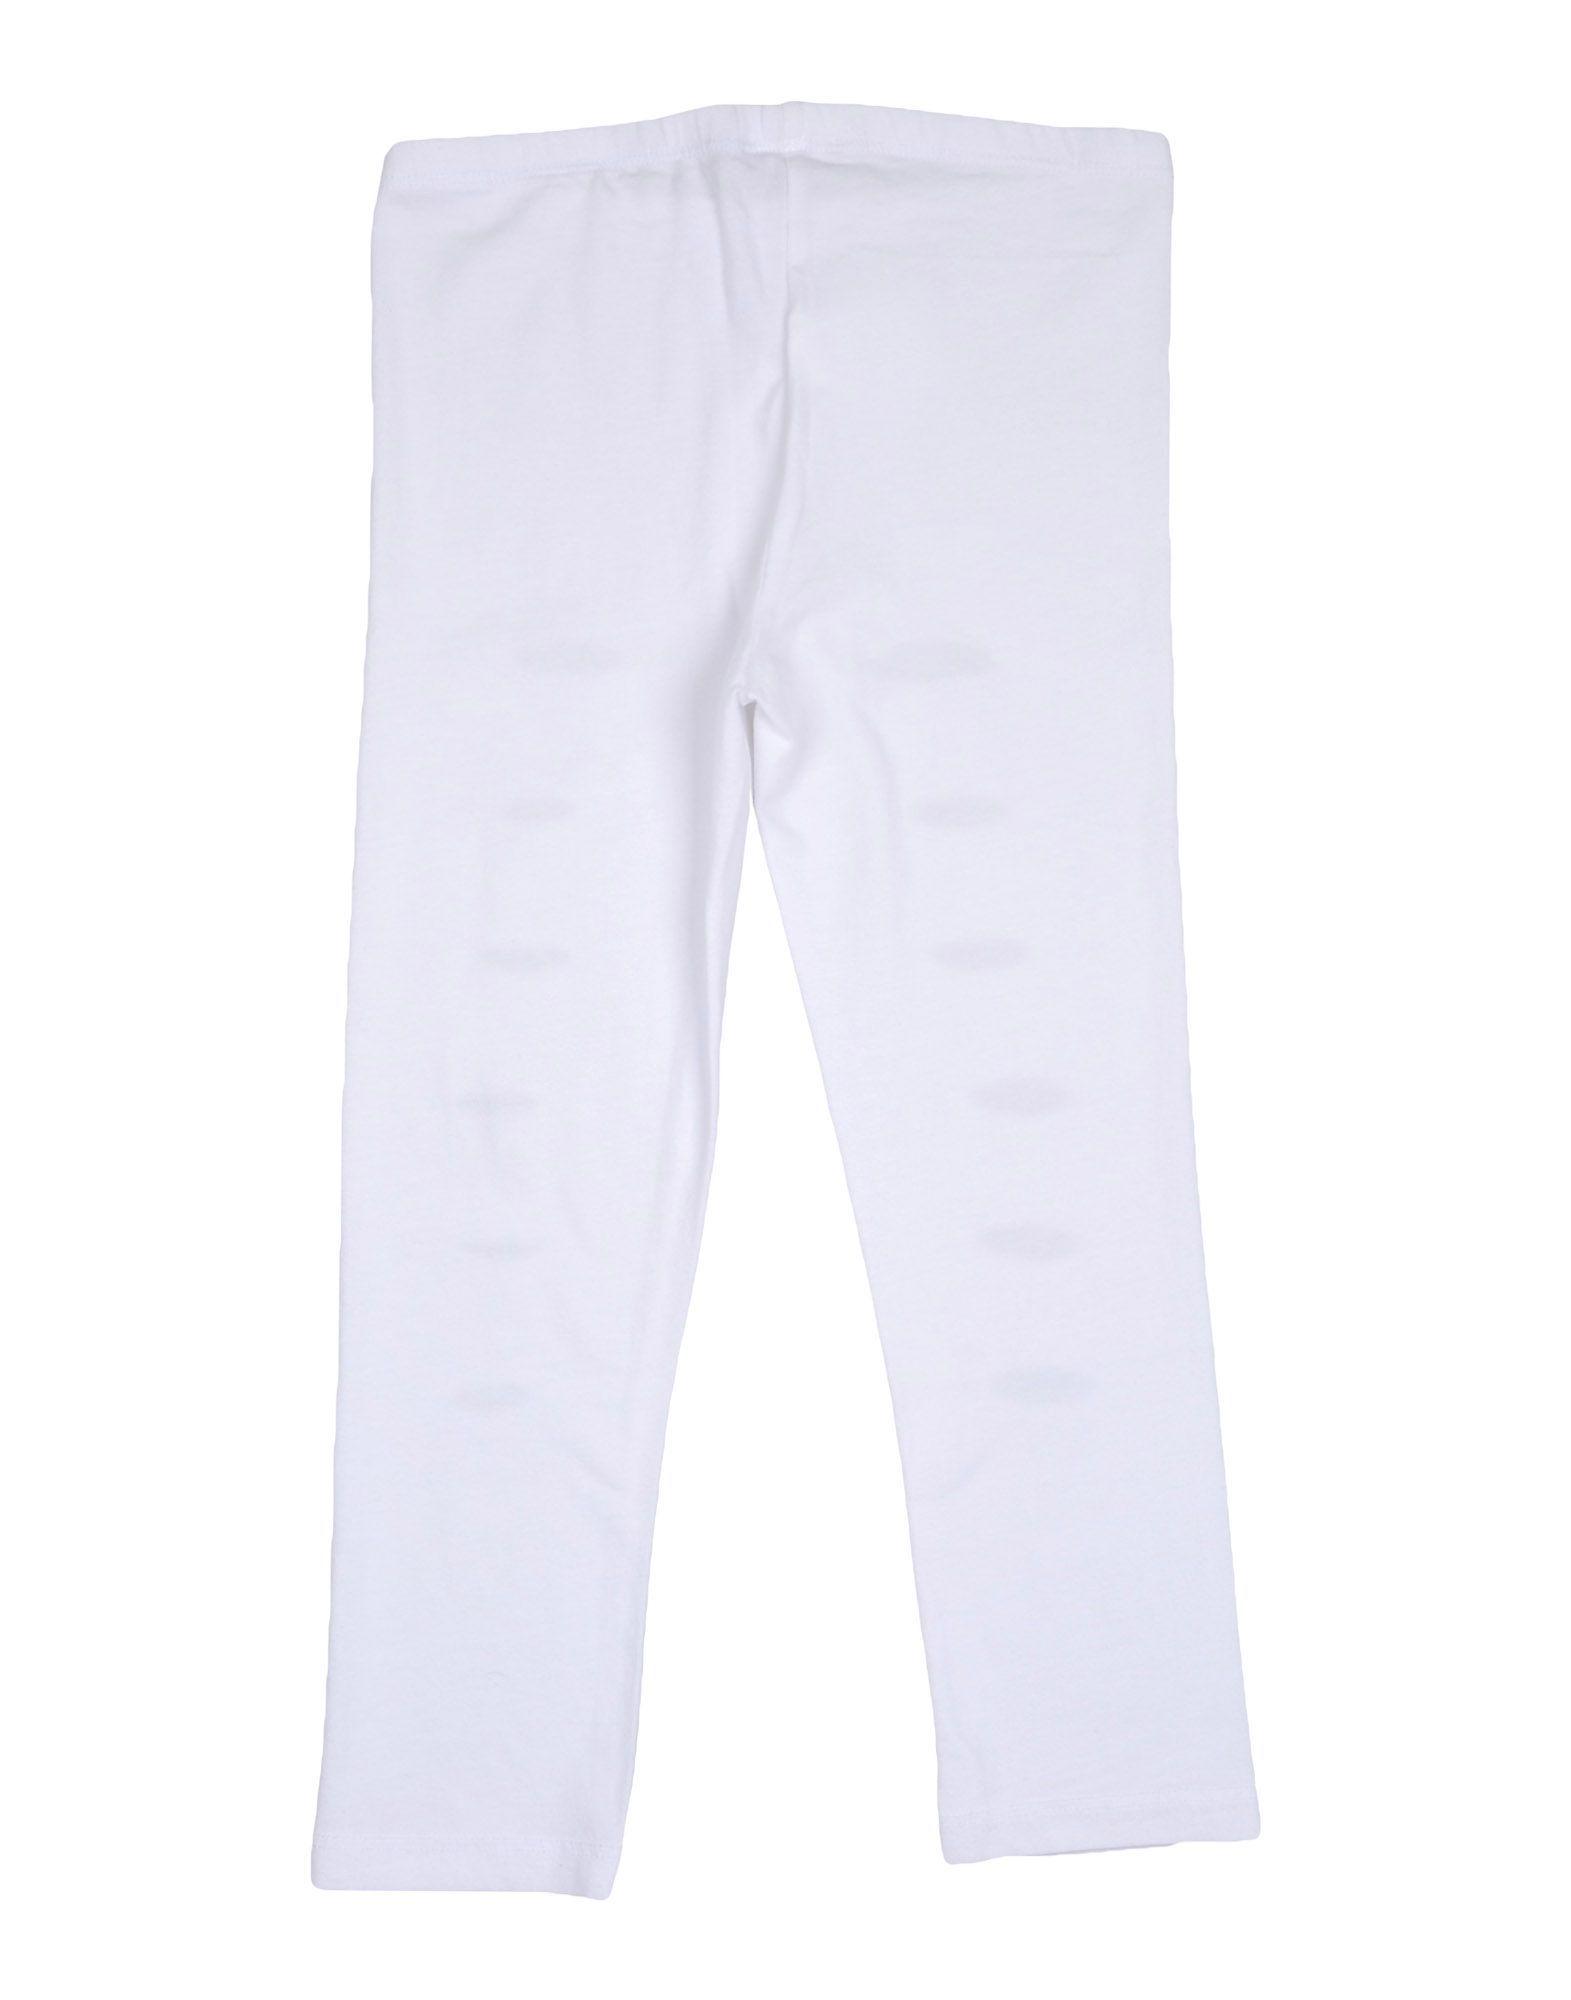 So Twee By Miss Grant Girl Leggings White Cotton